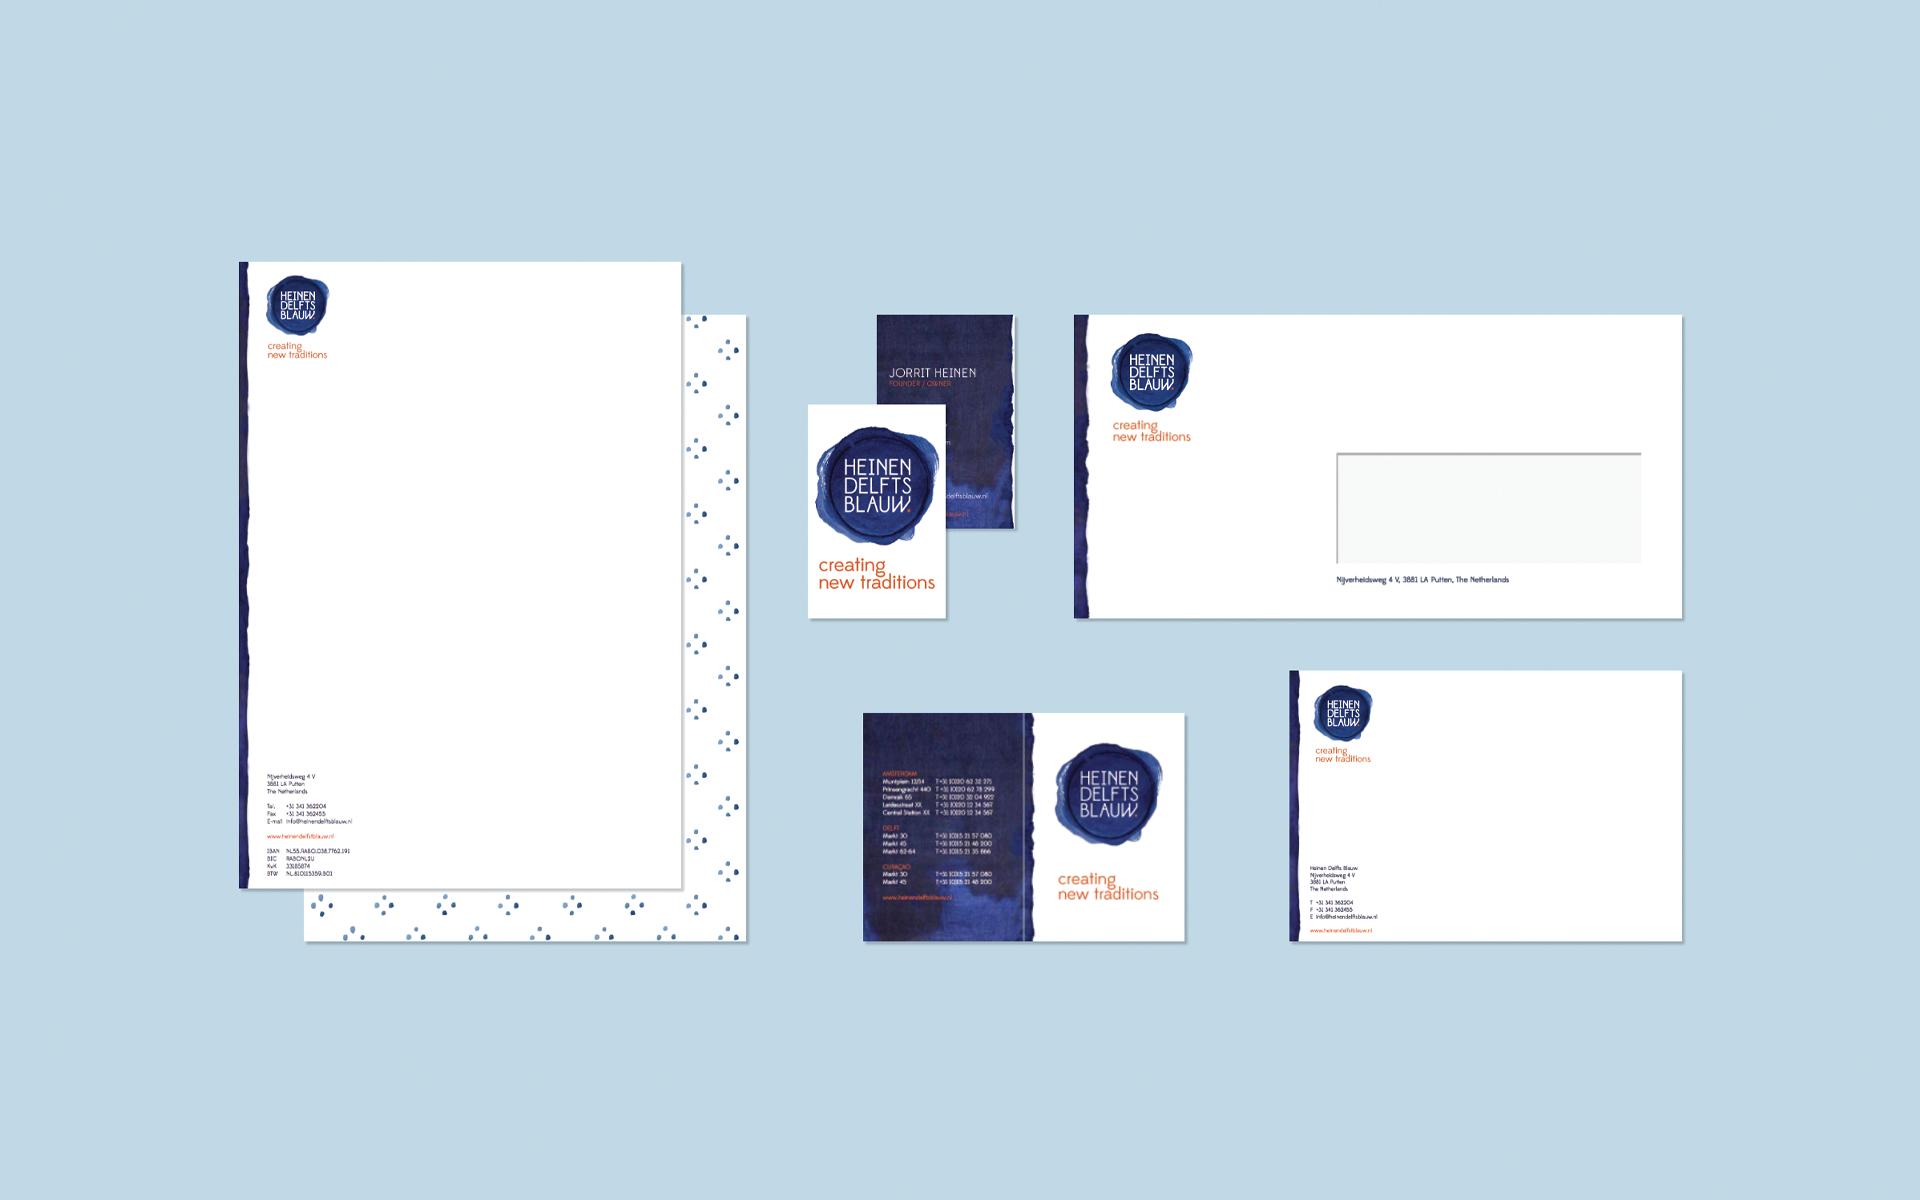 Heinen Delfts Blauw DAY Creative Brand Design Creating new traditions letterhead